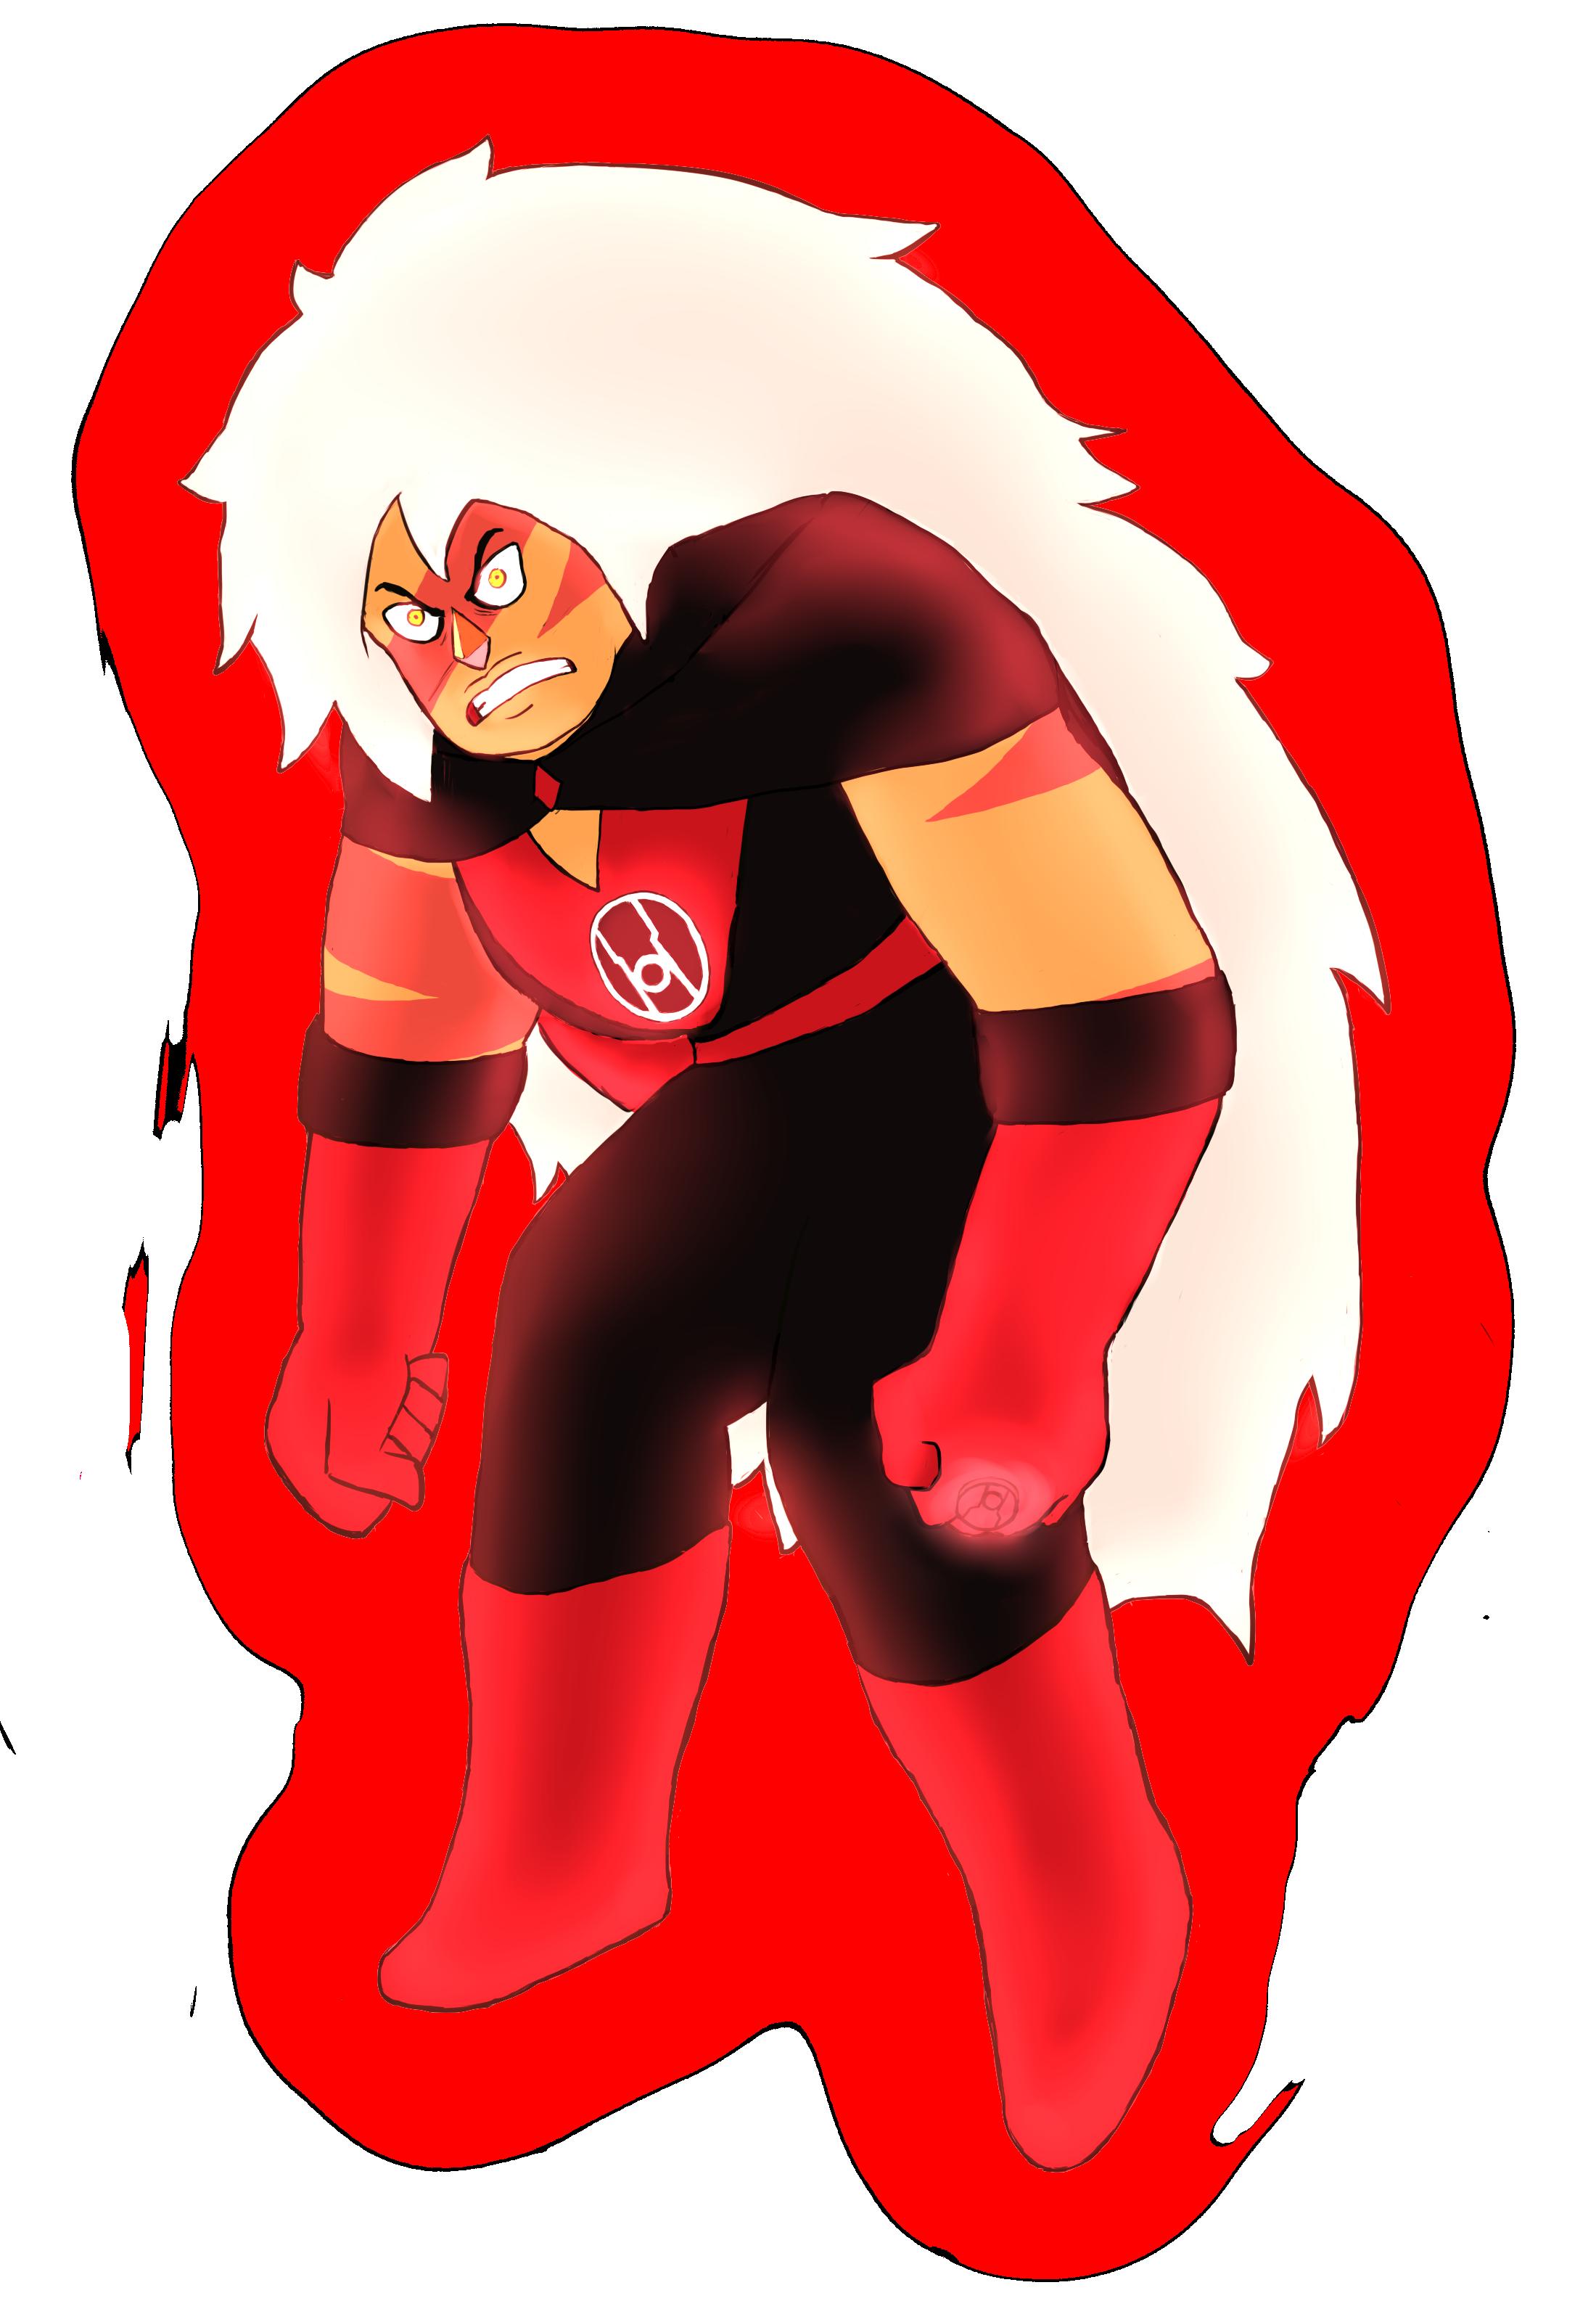 Red Lantern Jasper by BurningOleander on DeviantArt